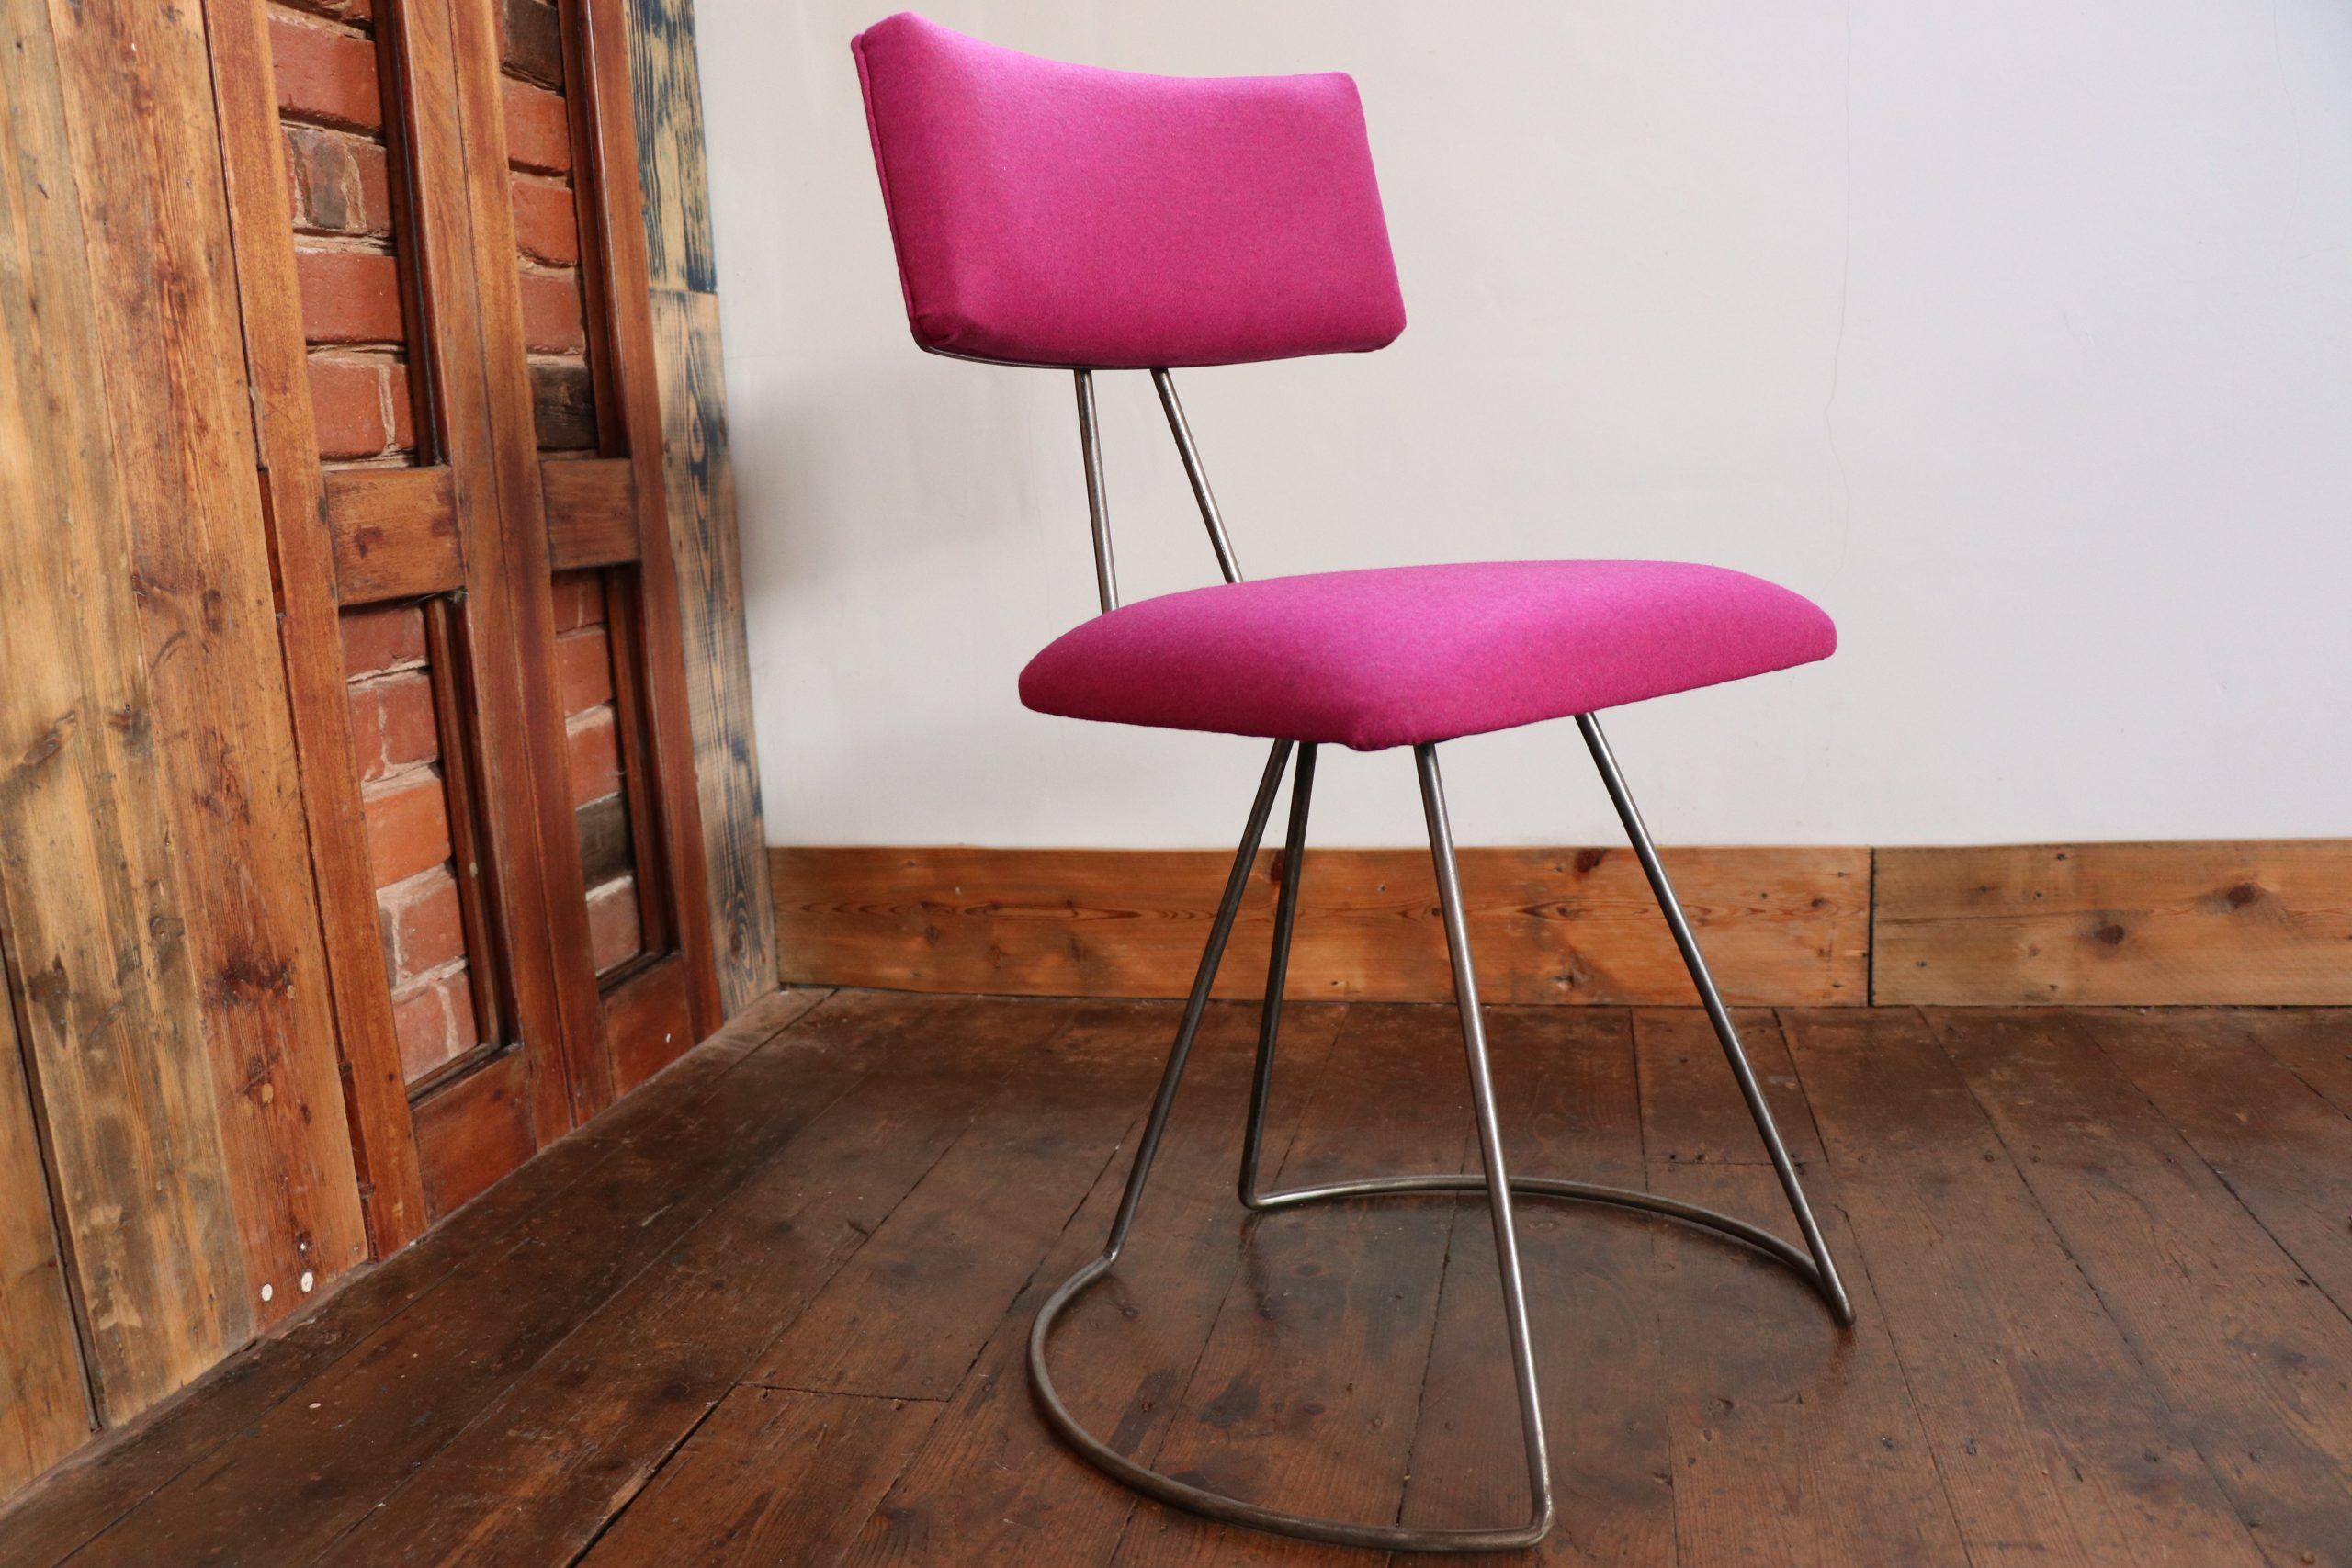 Linwood industrial chair